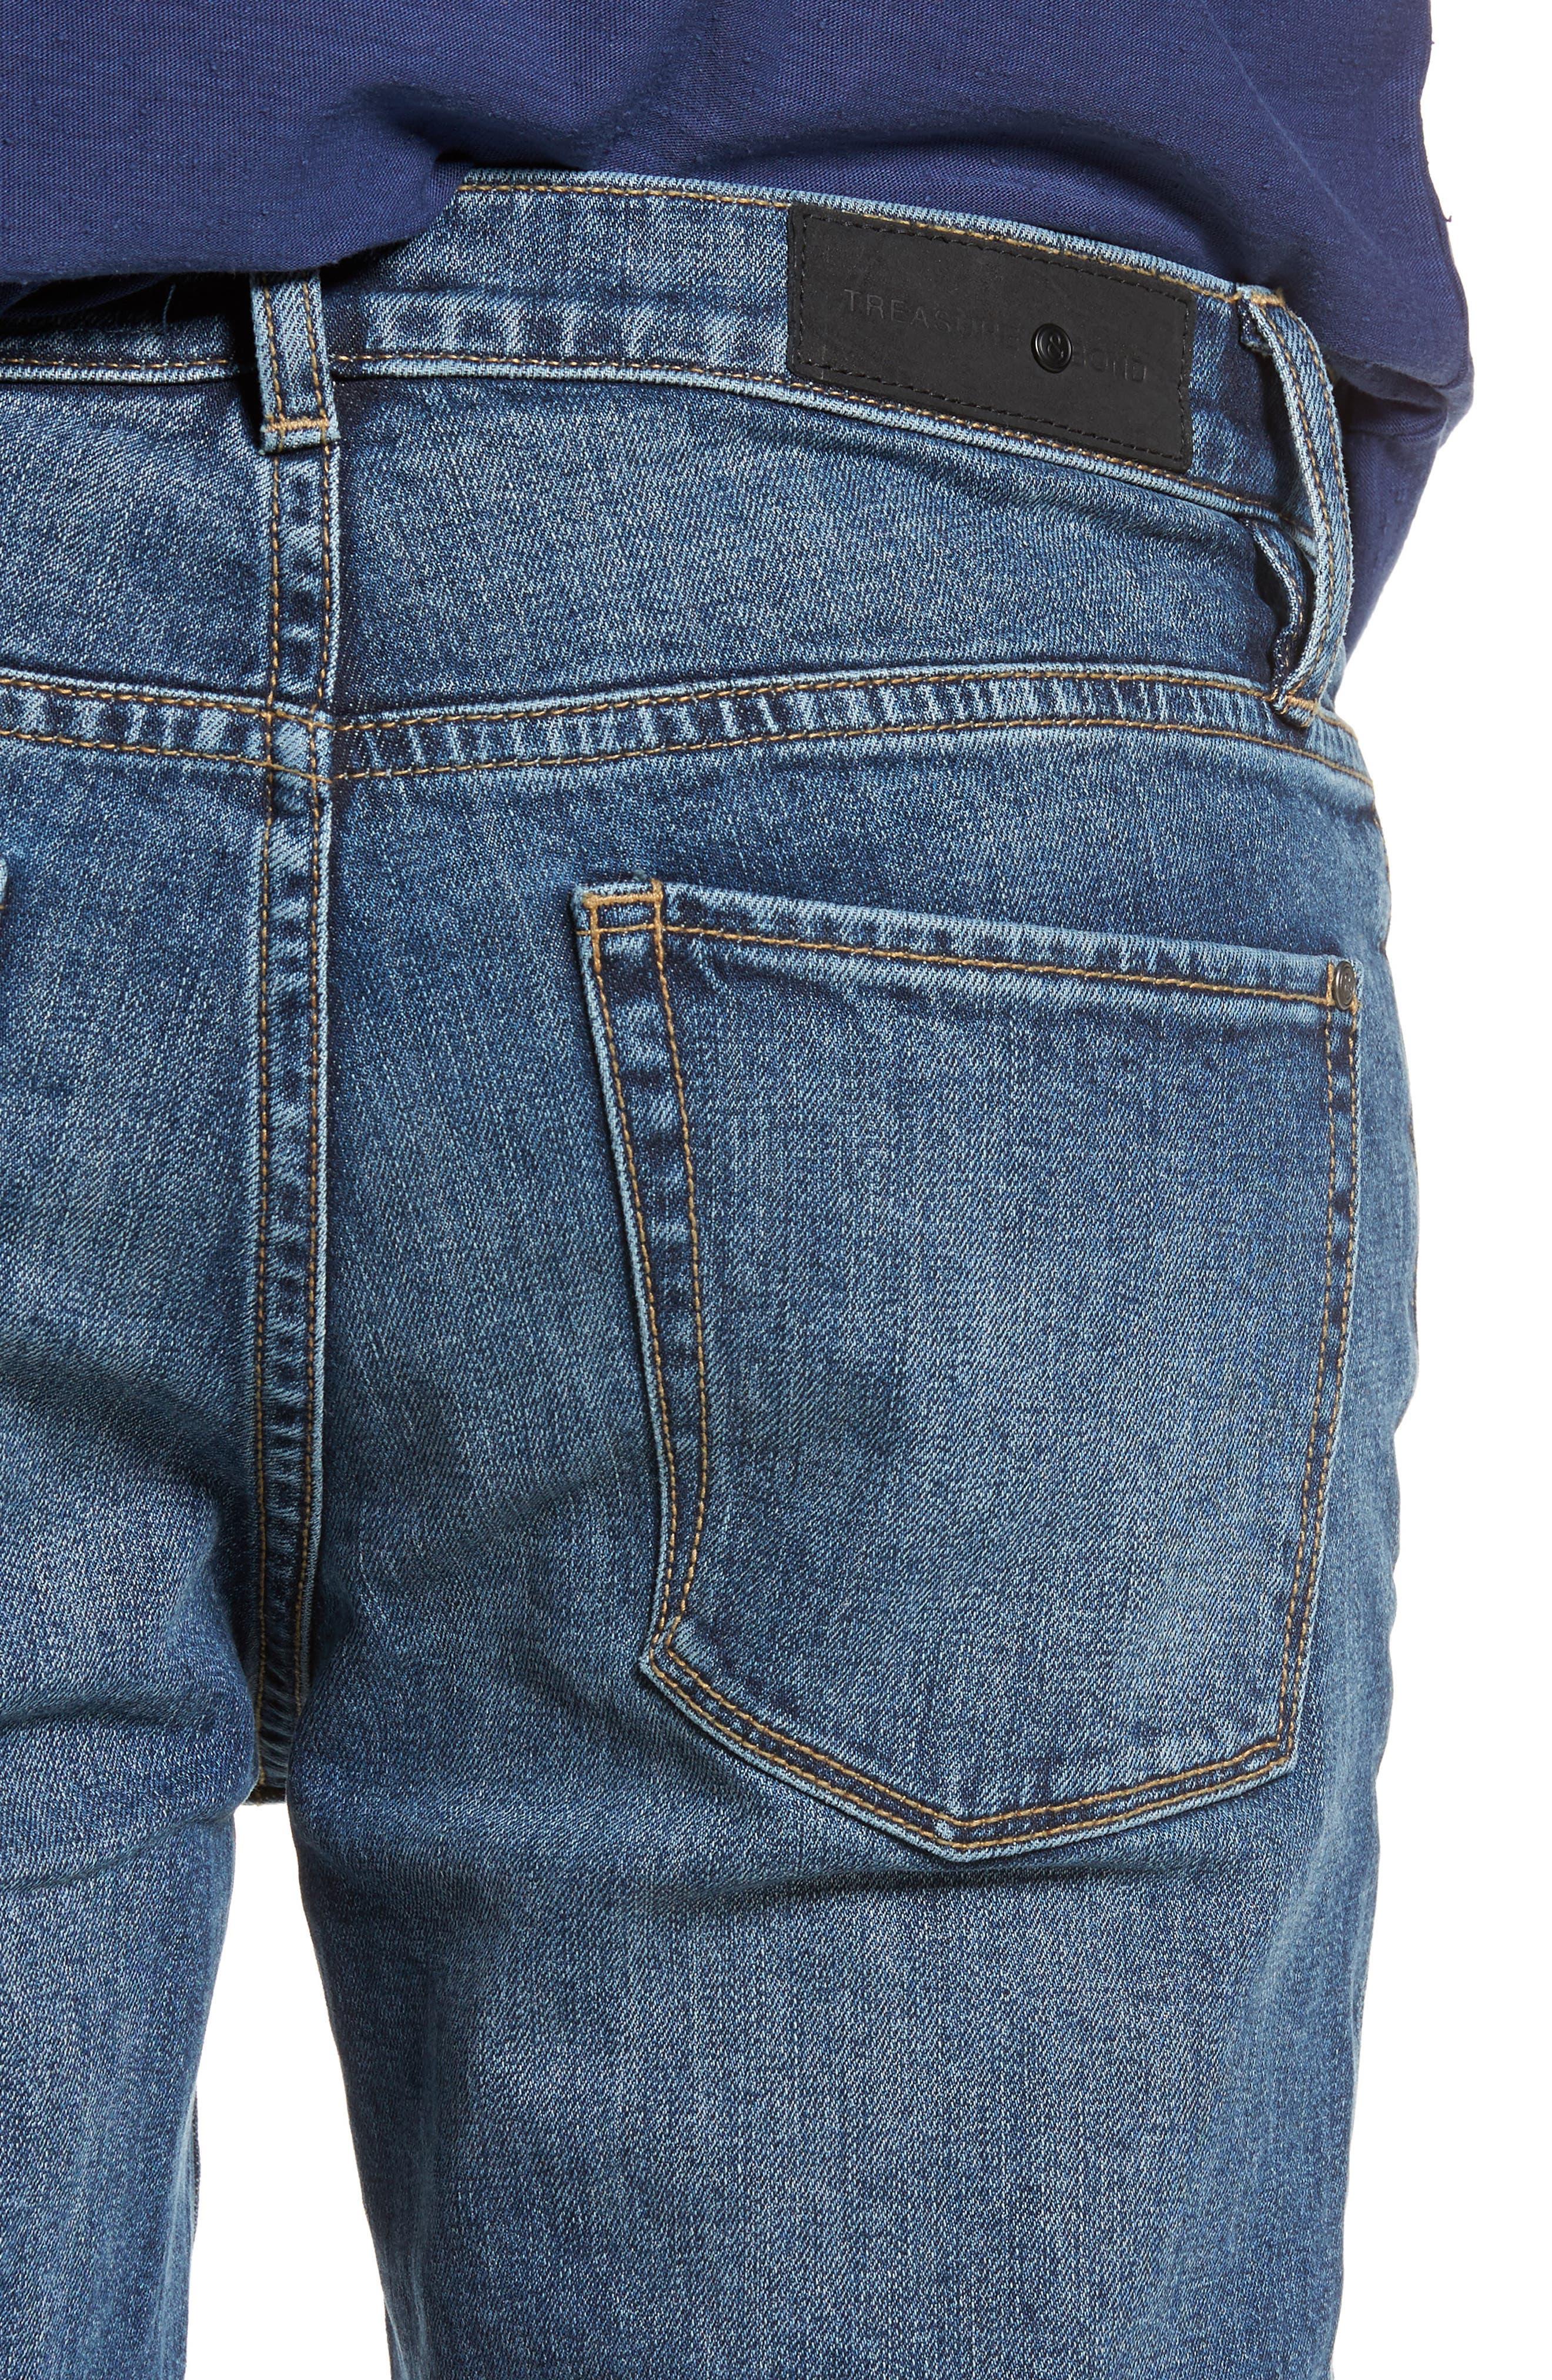 Skinny Fit Jeans,                             Alternate thumbnail 4, color,